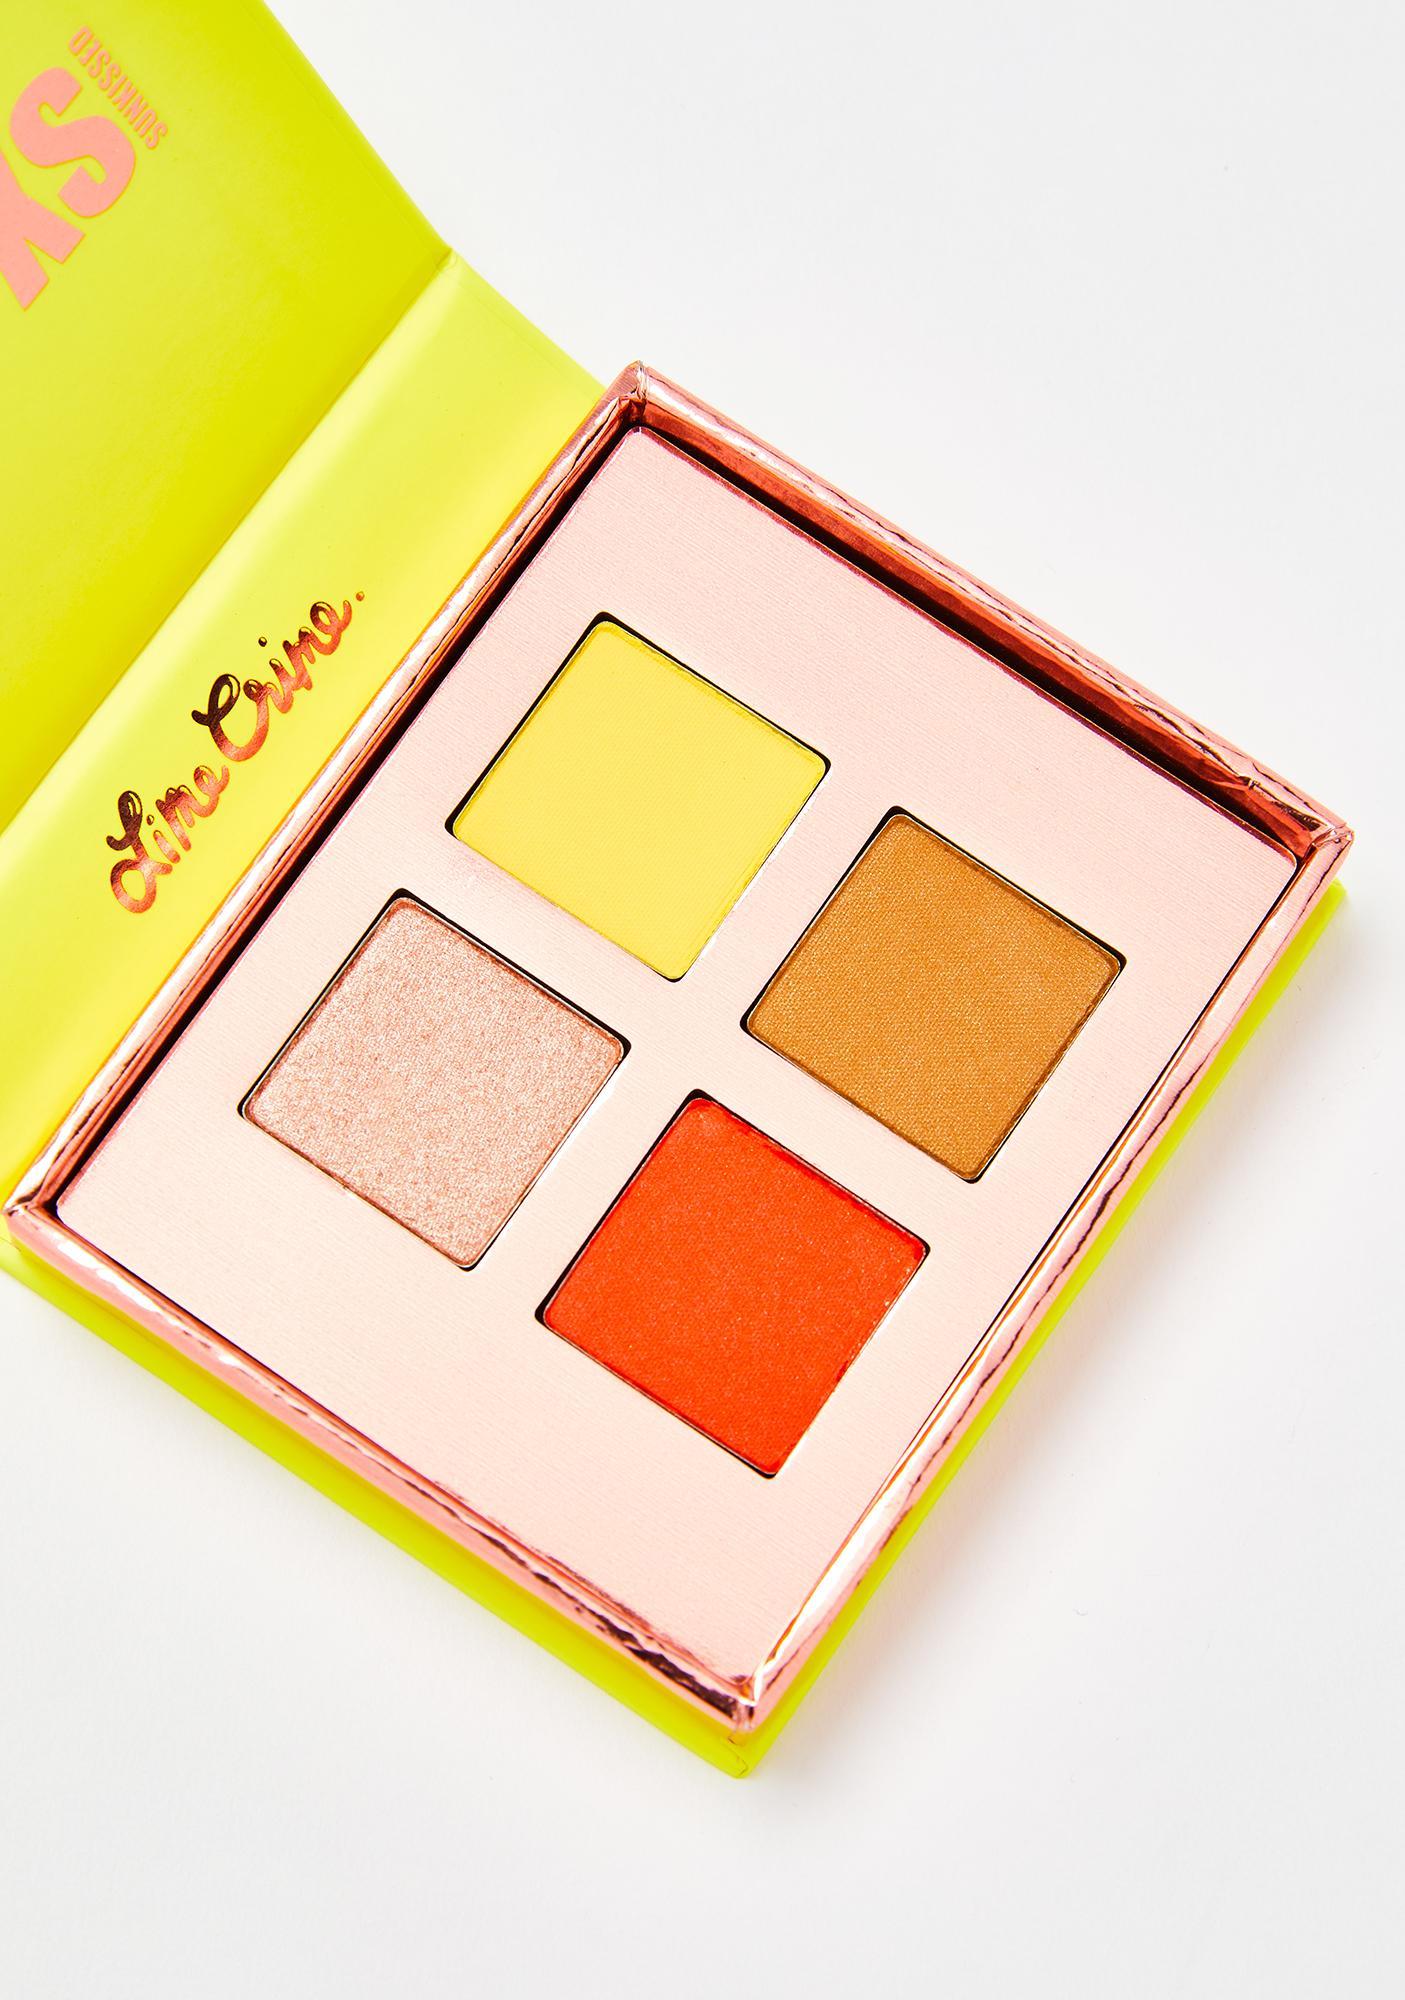 Lime Crime Venus XS Sunkissed Eyeshadow Palette